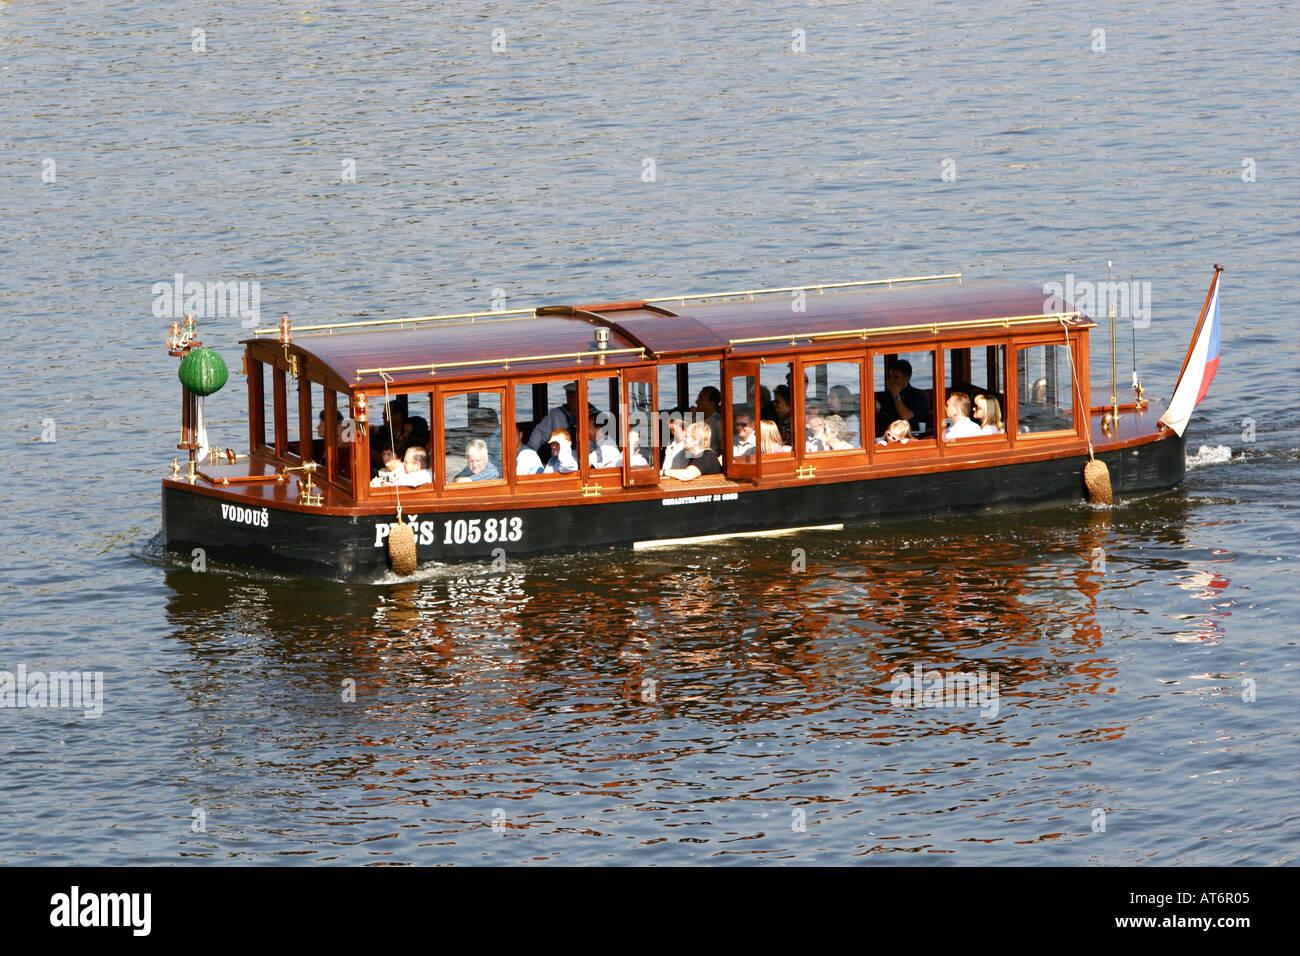 Tourist boat in Prague River Czech Republic - Stock Image